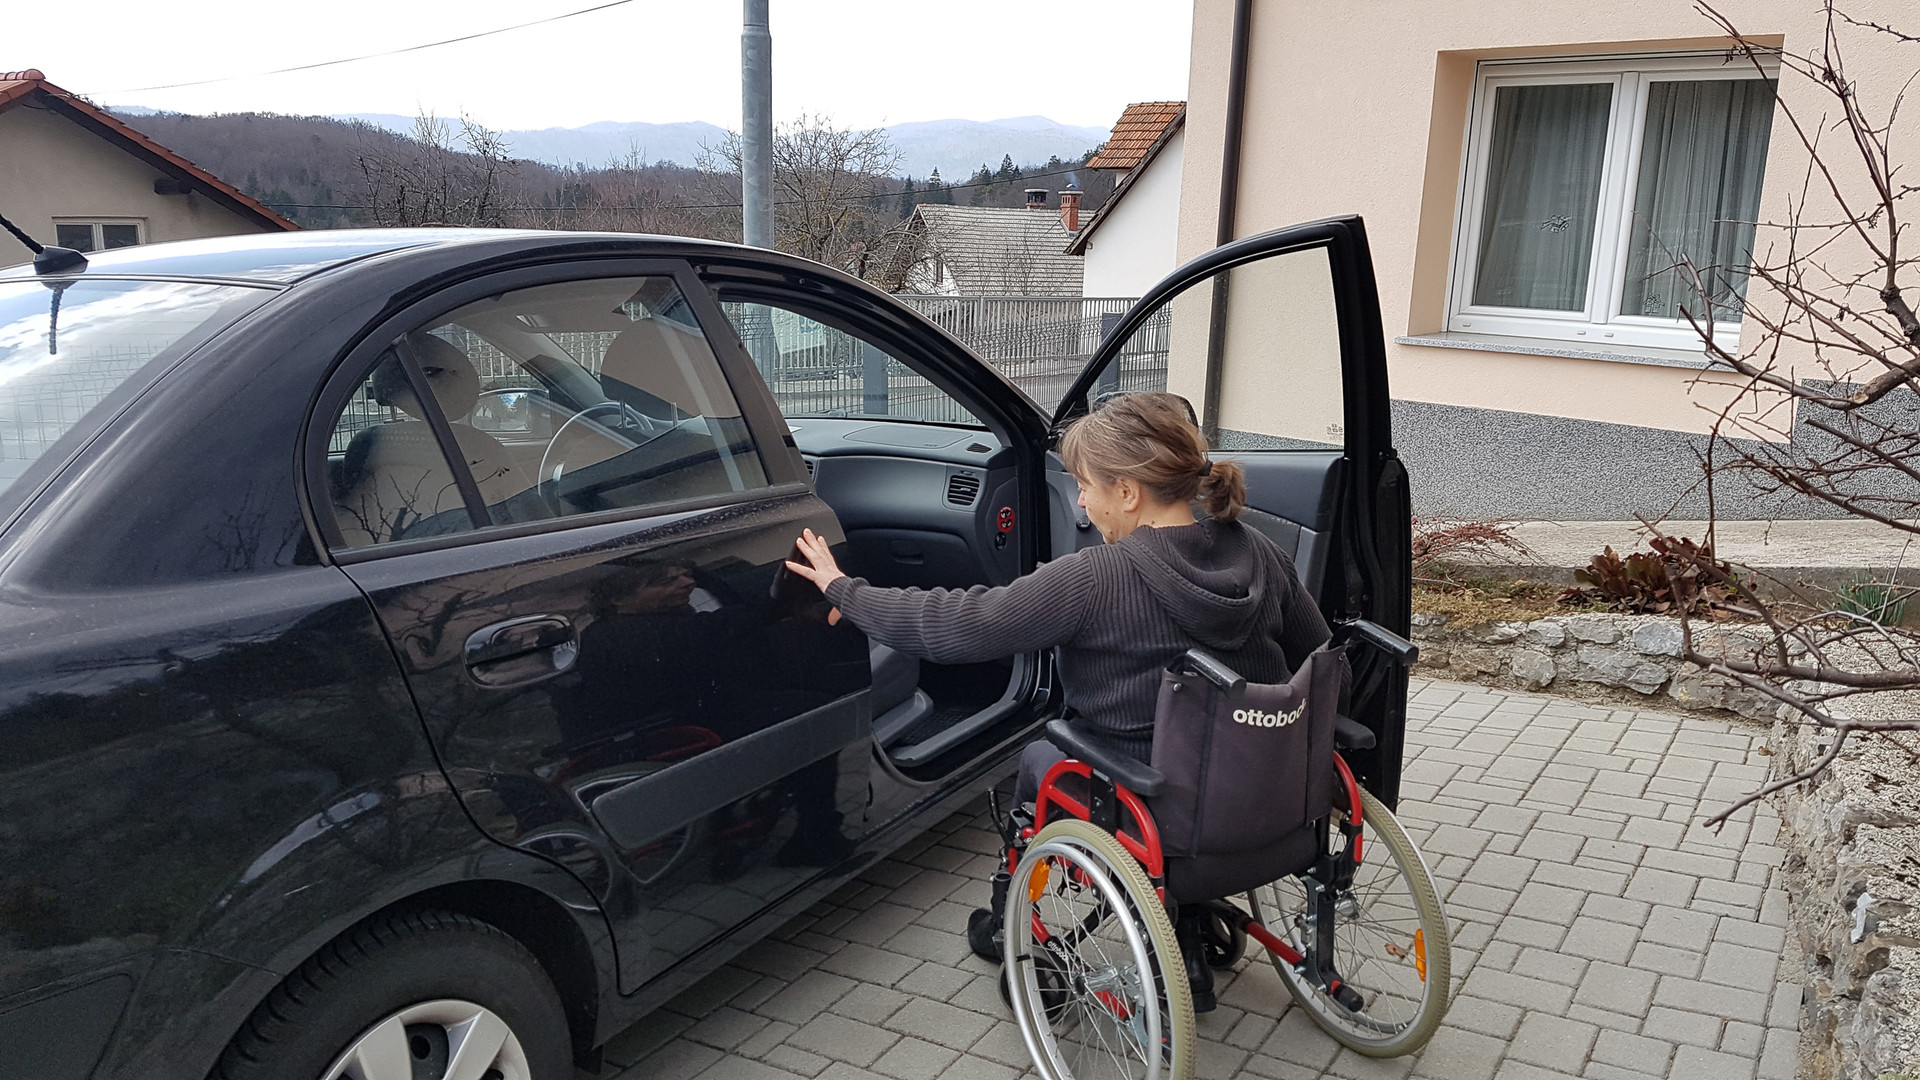 Mobilnost: uporaba osebnega avtomobila omogoča fleksibilnost in prilagodljivost, predvsem pa neodvisnost.  Mobility: using a personal vehicle provides flexibility and adaptability, but above all – independence.